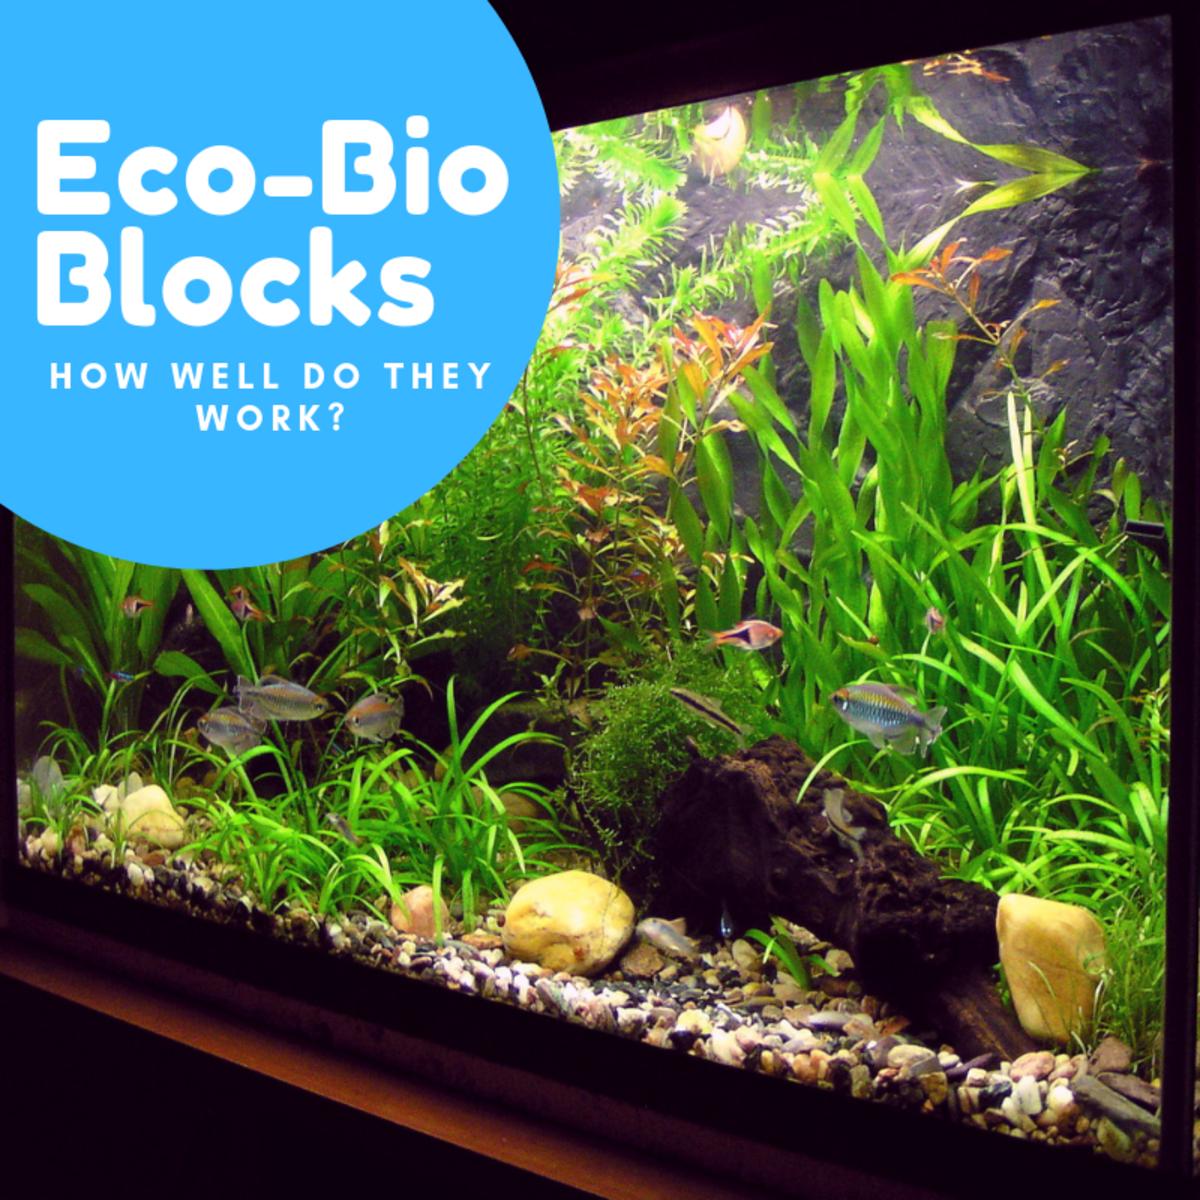 How Do Eco-Bio Blocks Improve Aquarium Water Quality?